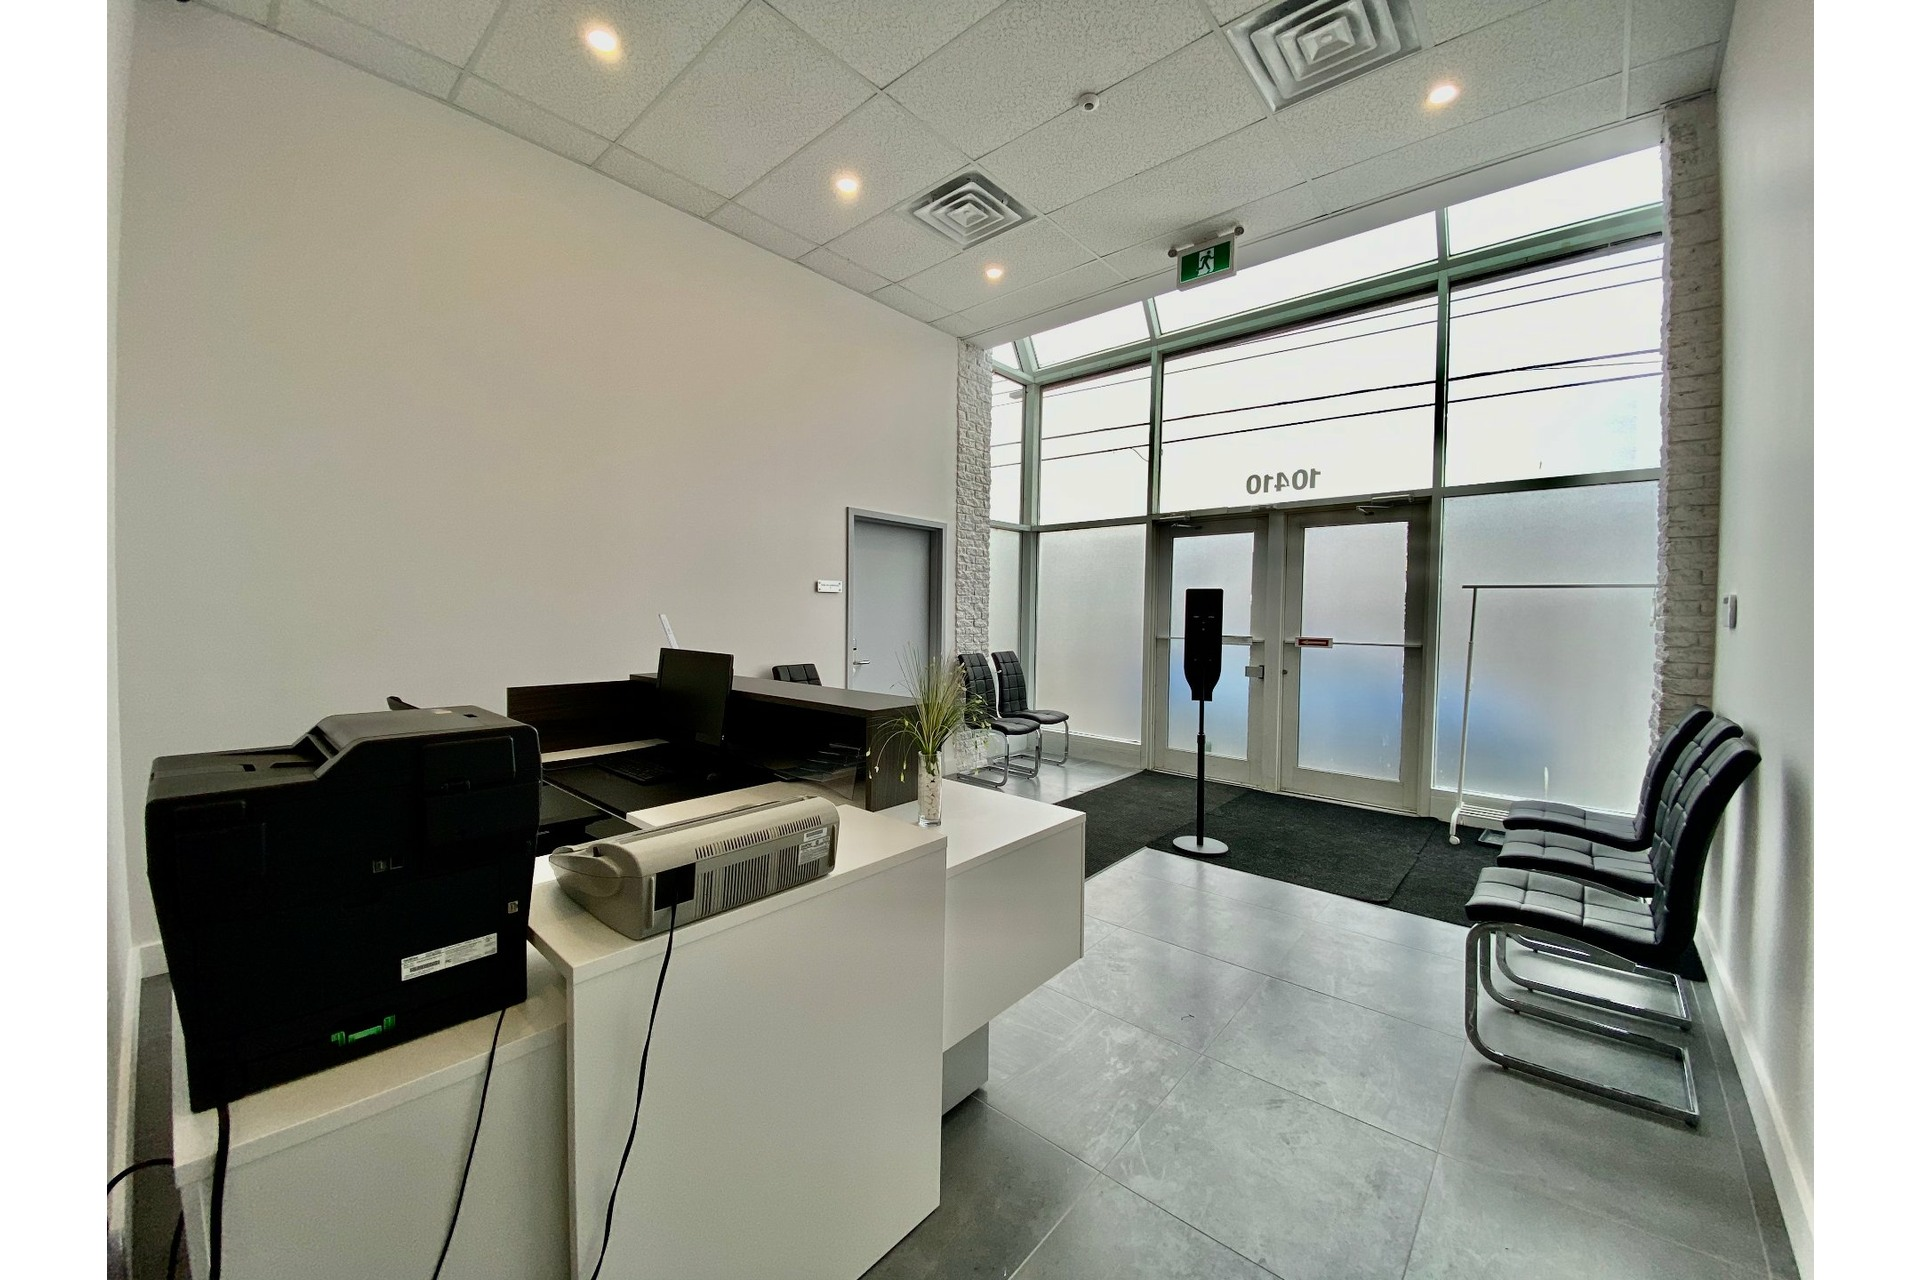 image 2 - MX - Oficina - MX Para alquiler Pierrefonds-Roxboro Montréal